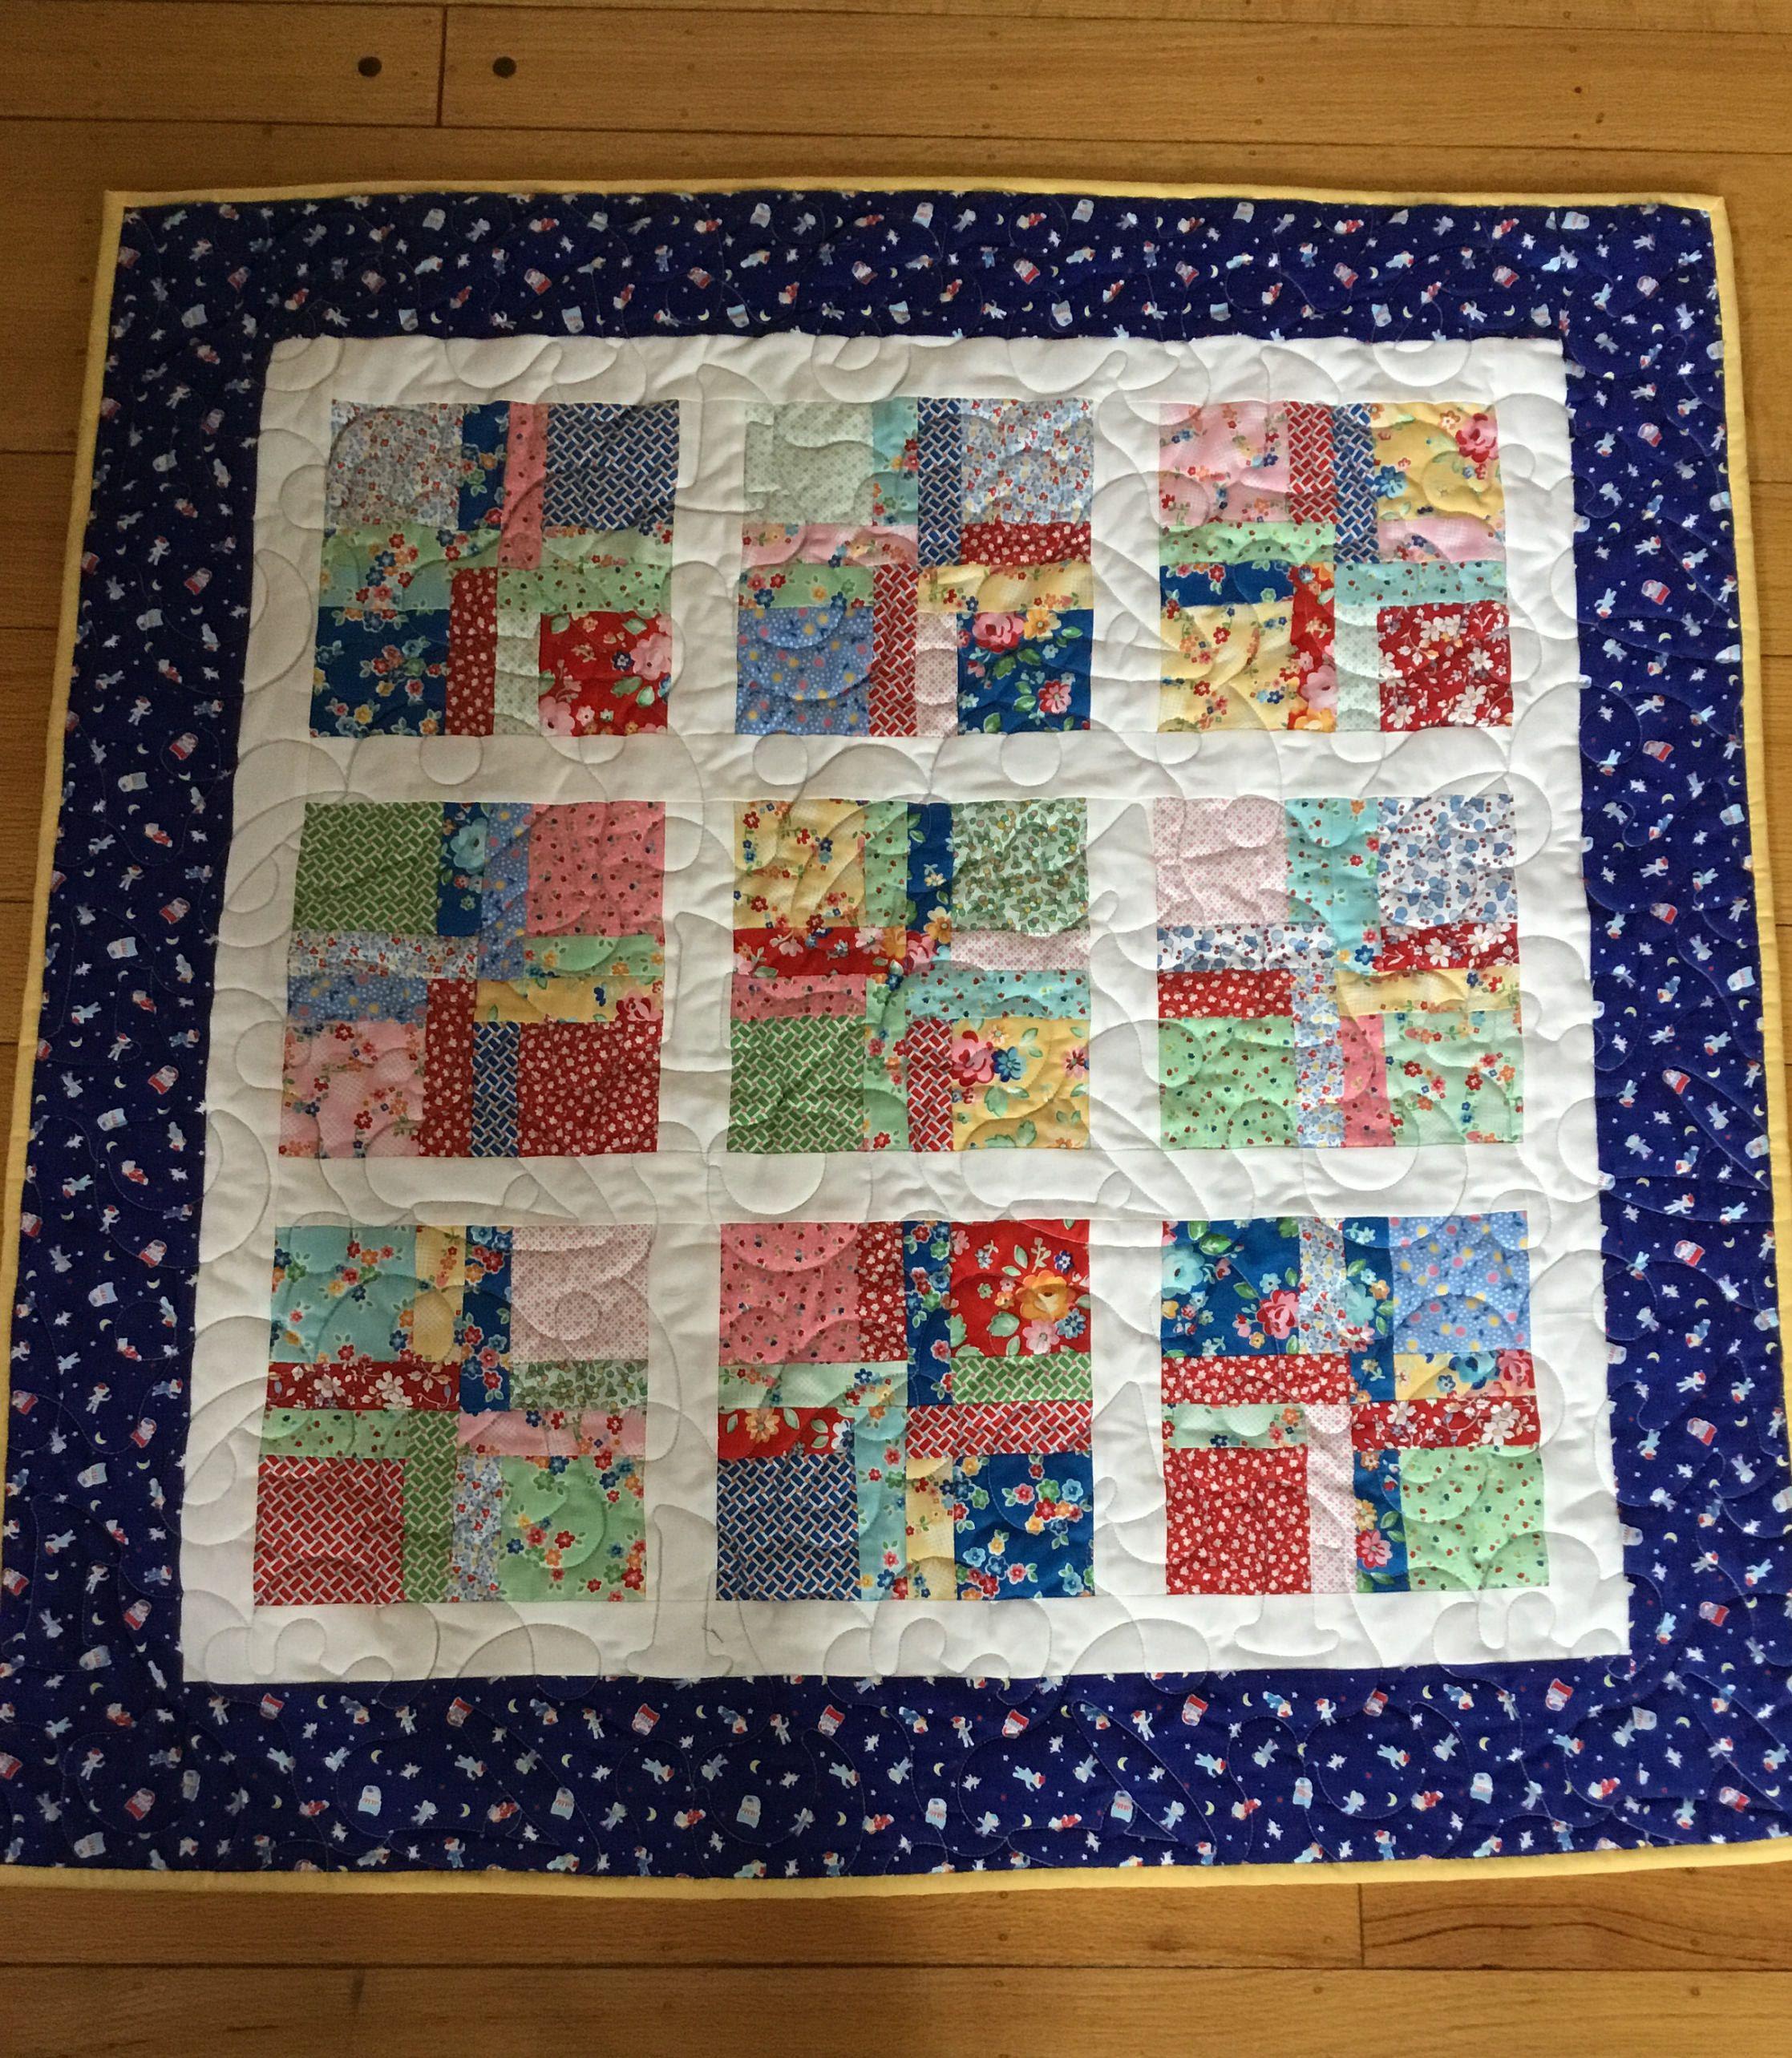 Baby Retro Quilt, Quilts for Sale, Handmade Quilts, Baby Quilts ... : where to sell handmade quilts - Adamdwight.com